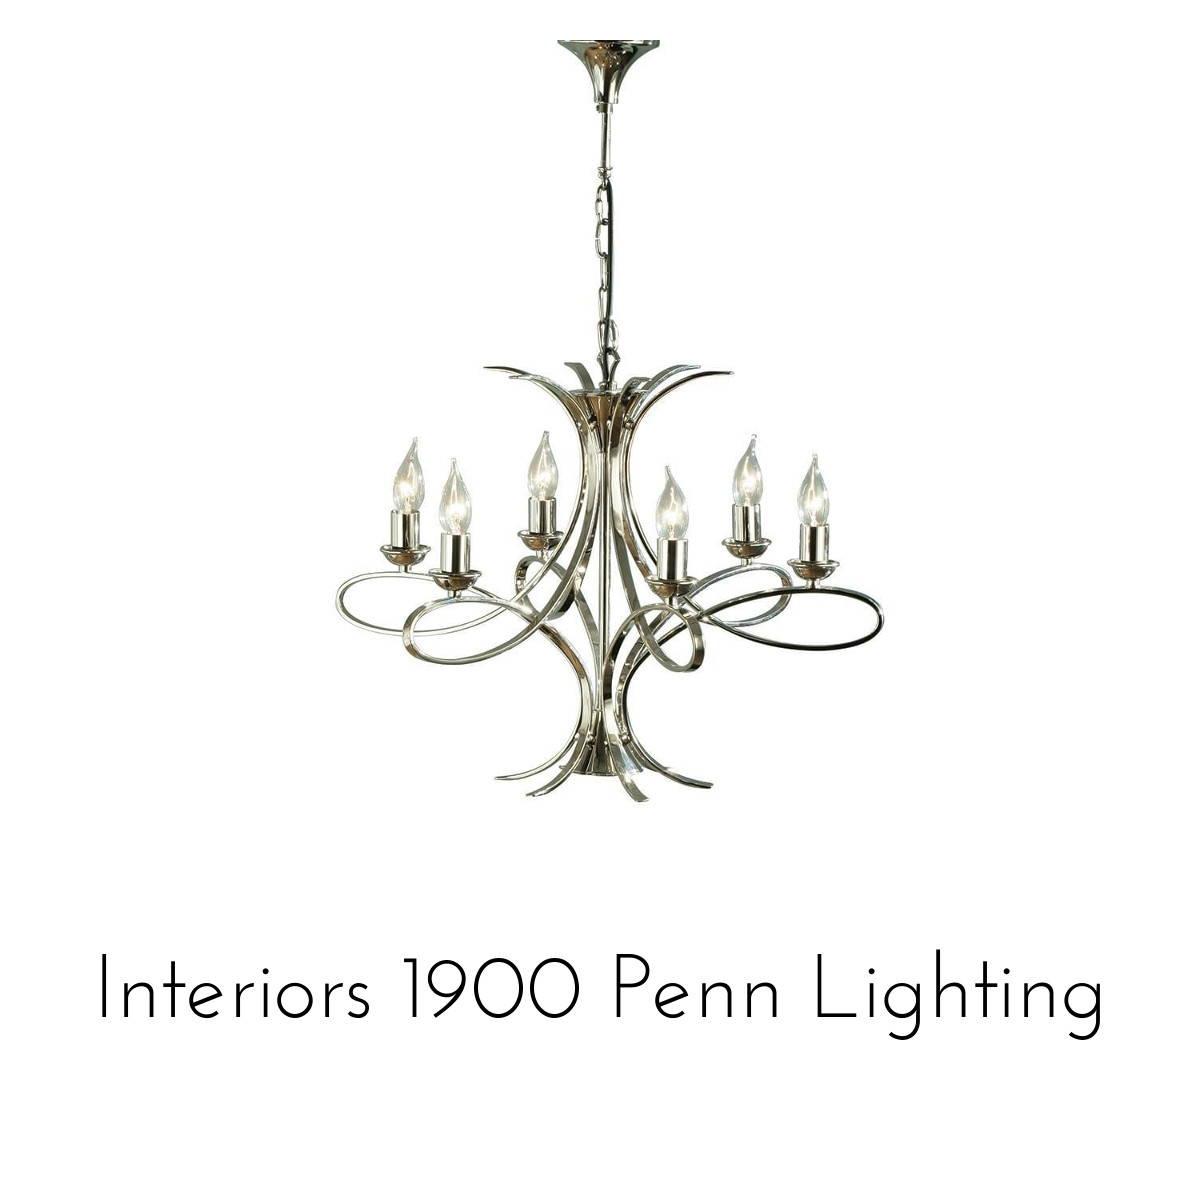 interiors 1900 penn lighting collection